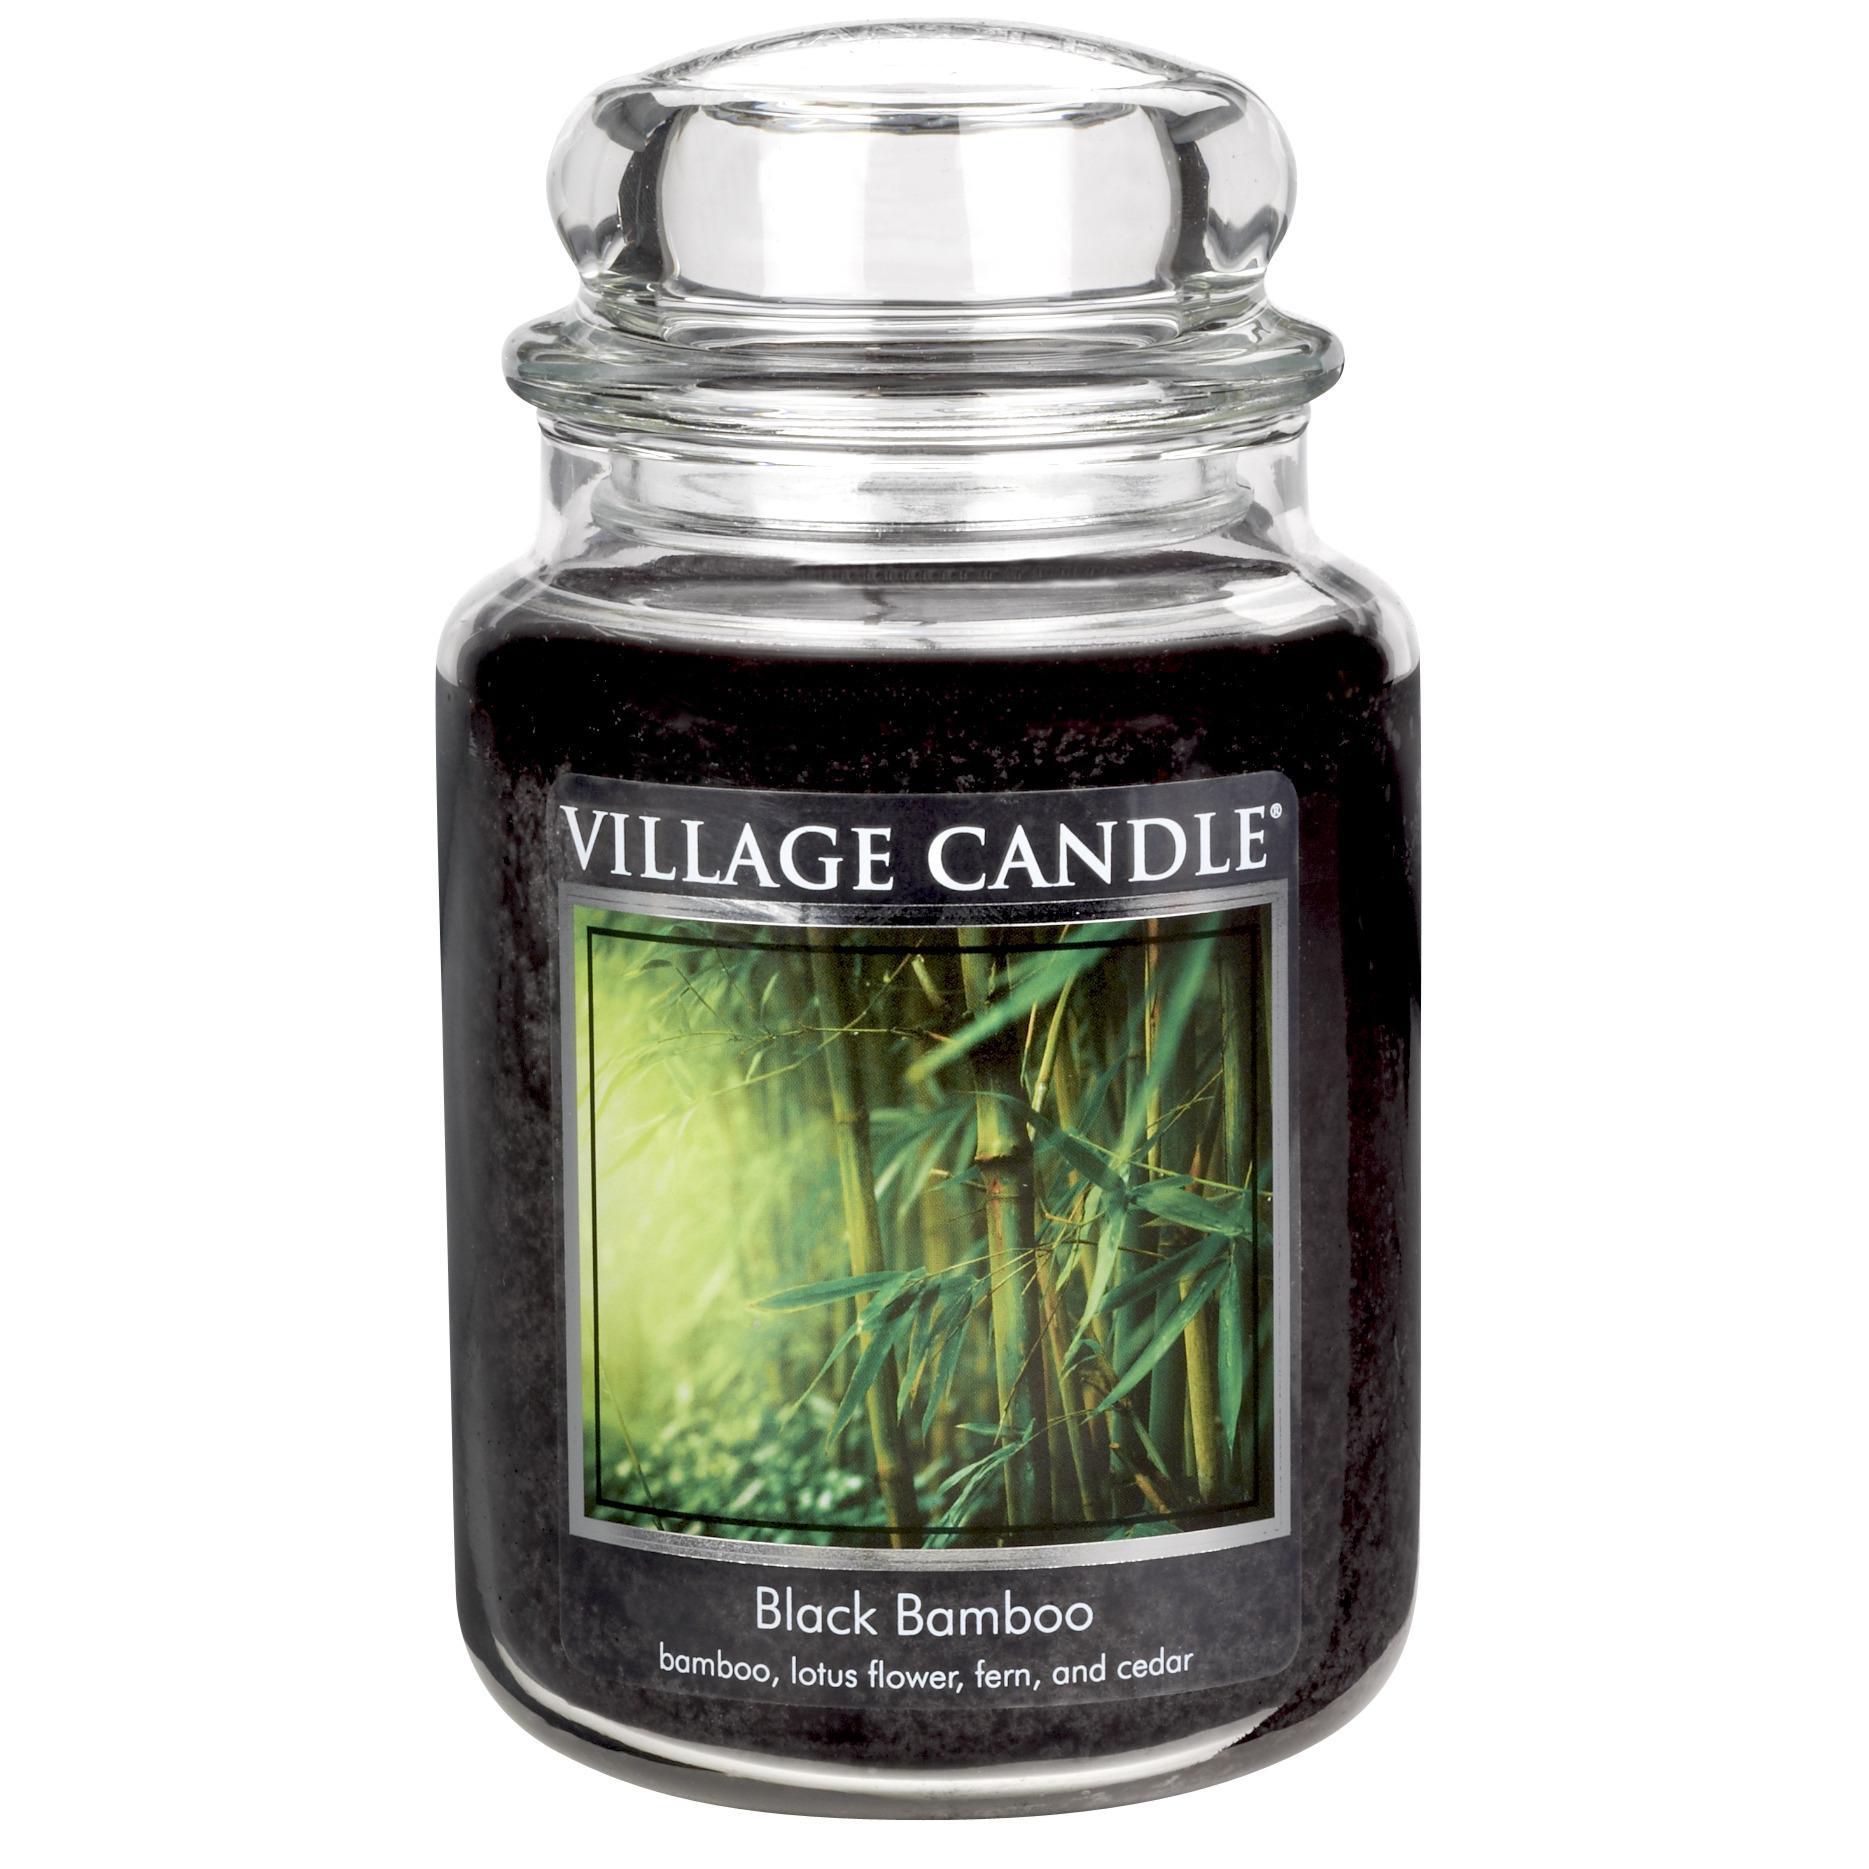 Black Bamboo Candle 26oz